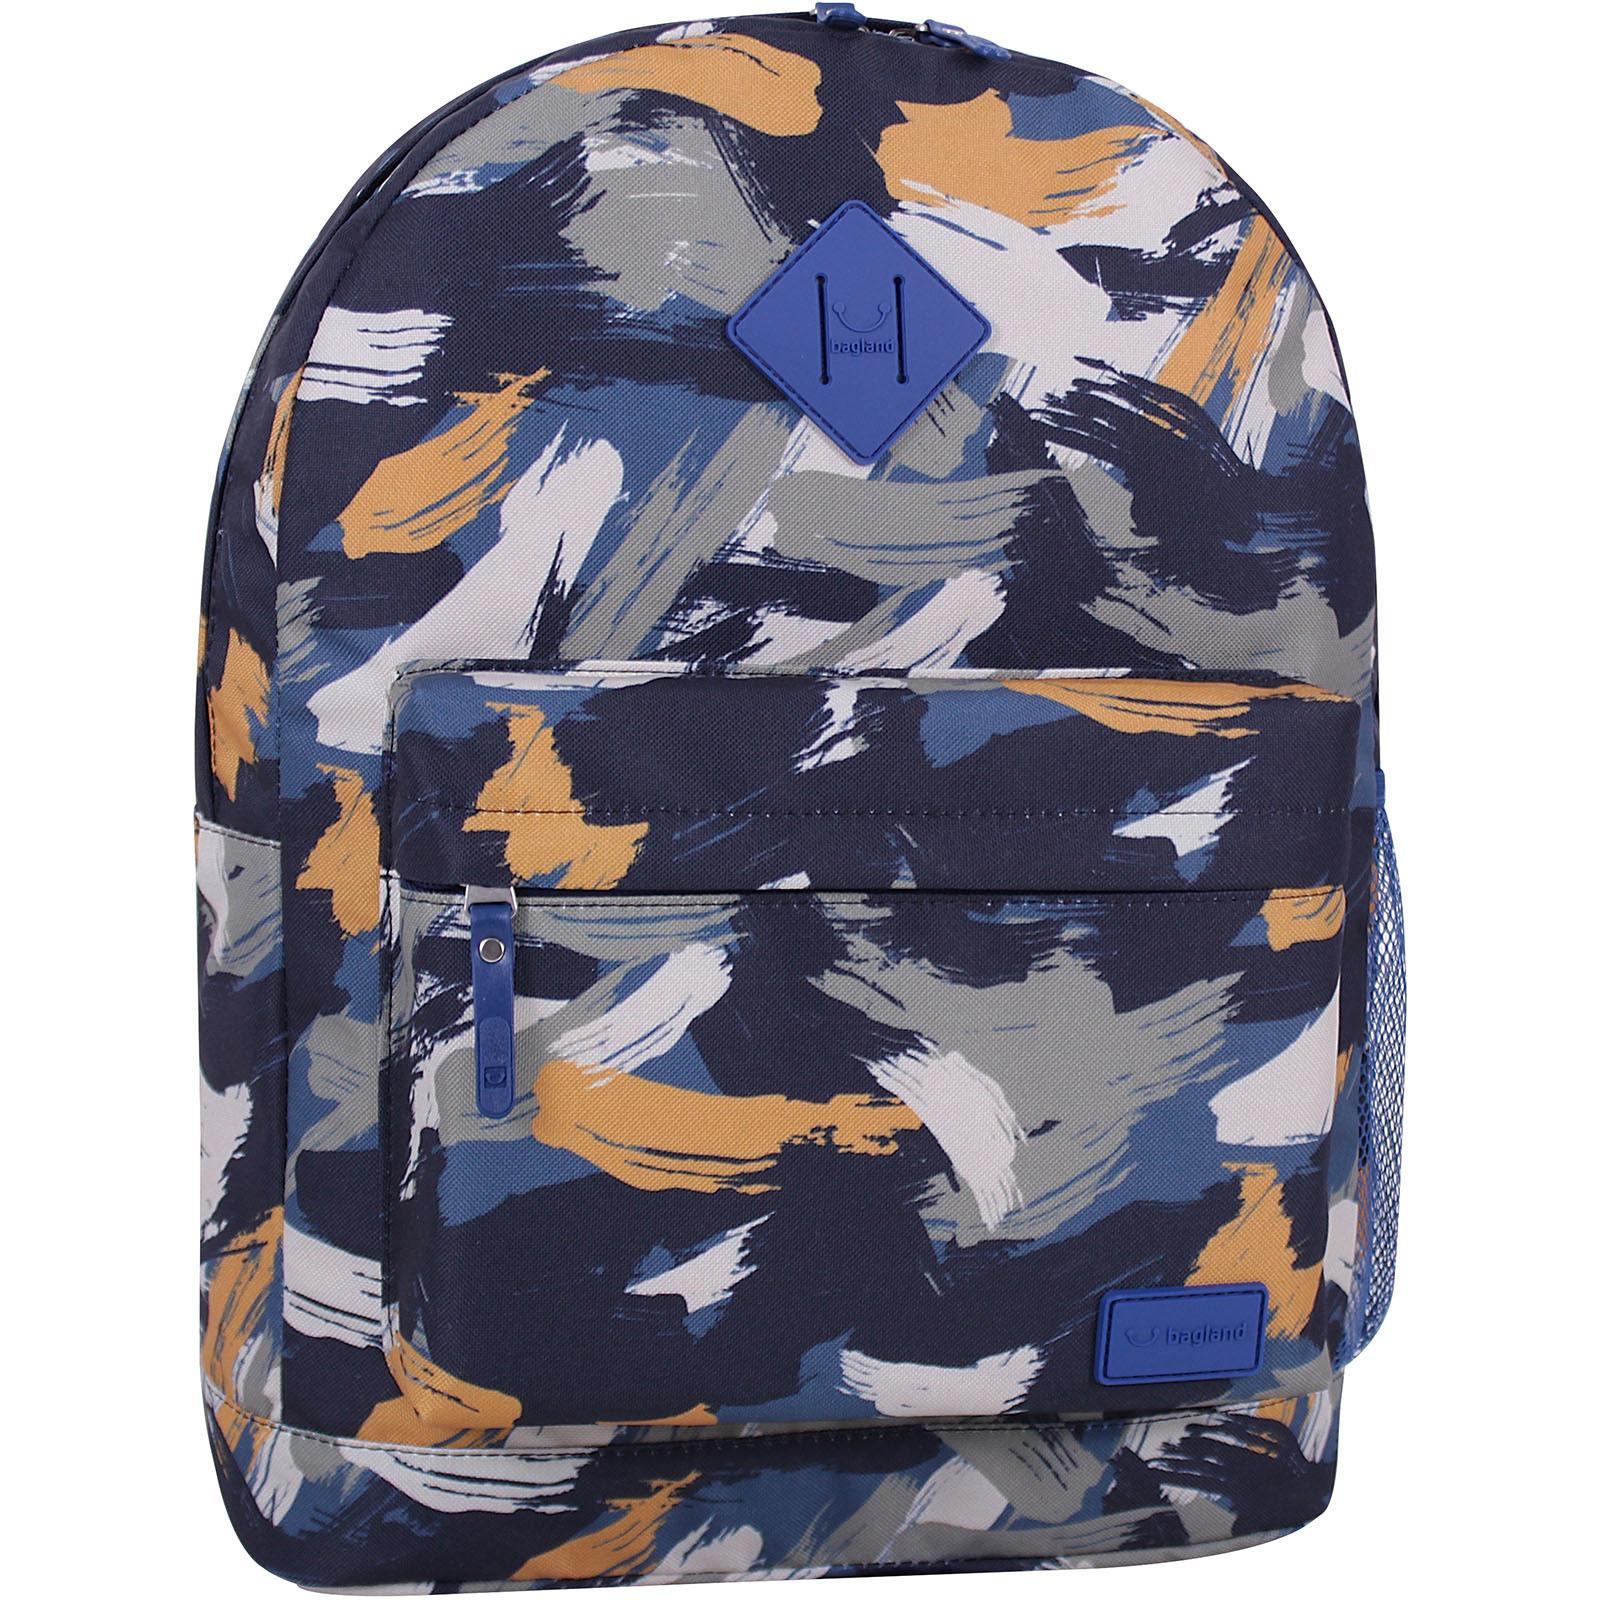 Молодежные рюкзаки Рюкзак Bagland Молодежный 17 л. сублимация 773 (00533664) IMG_7017_суб.773_.JPG